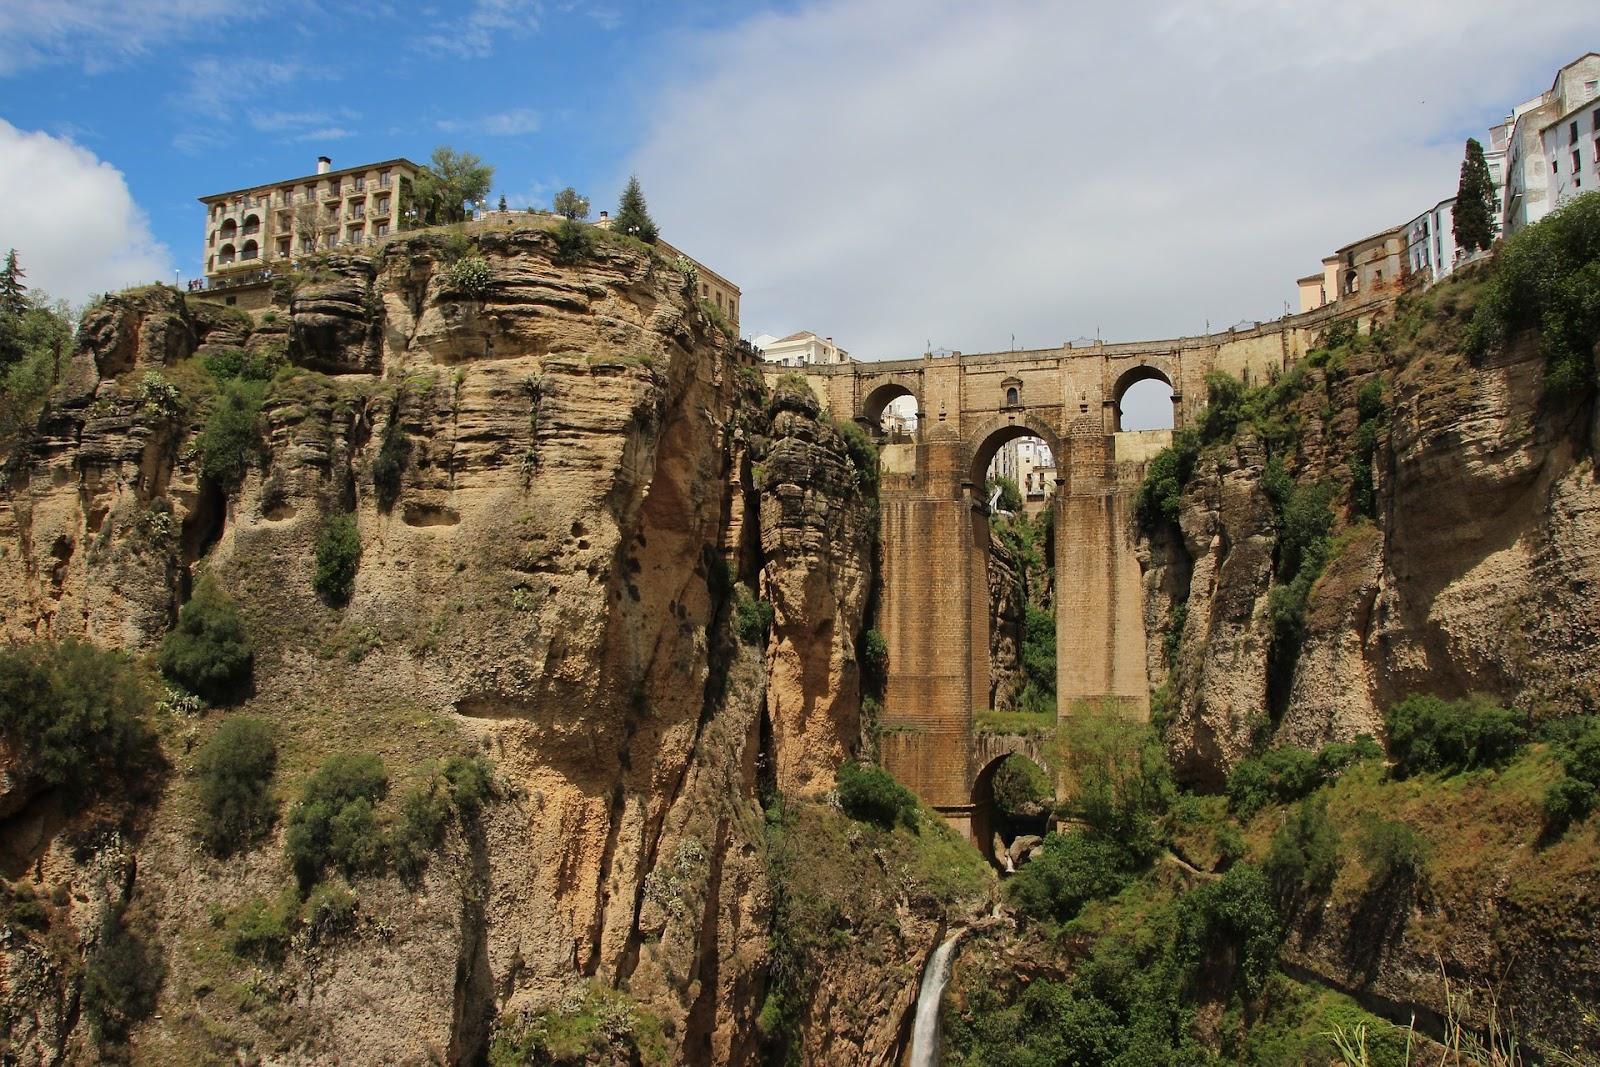 ronda spain cliff bridges and waterfall town costa del sol